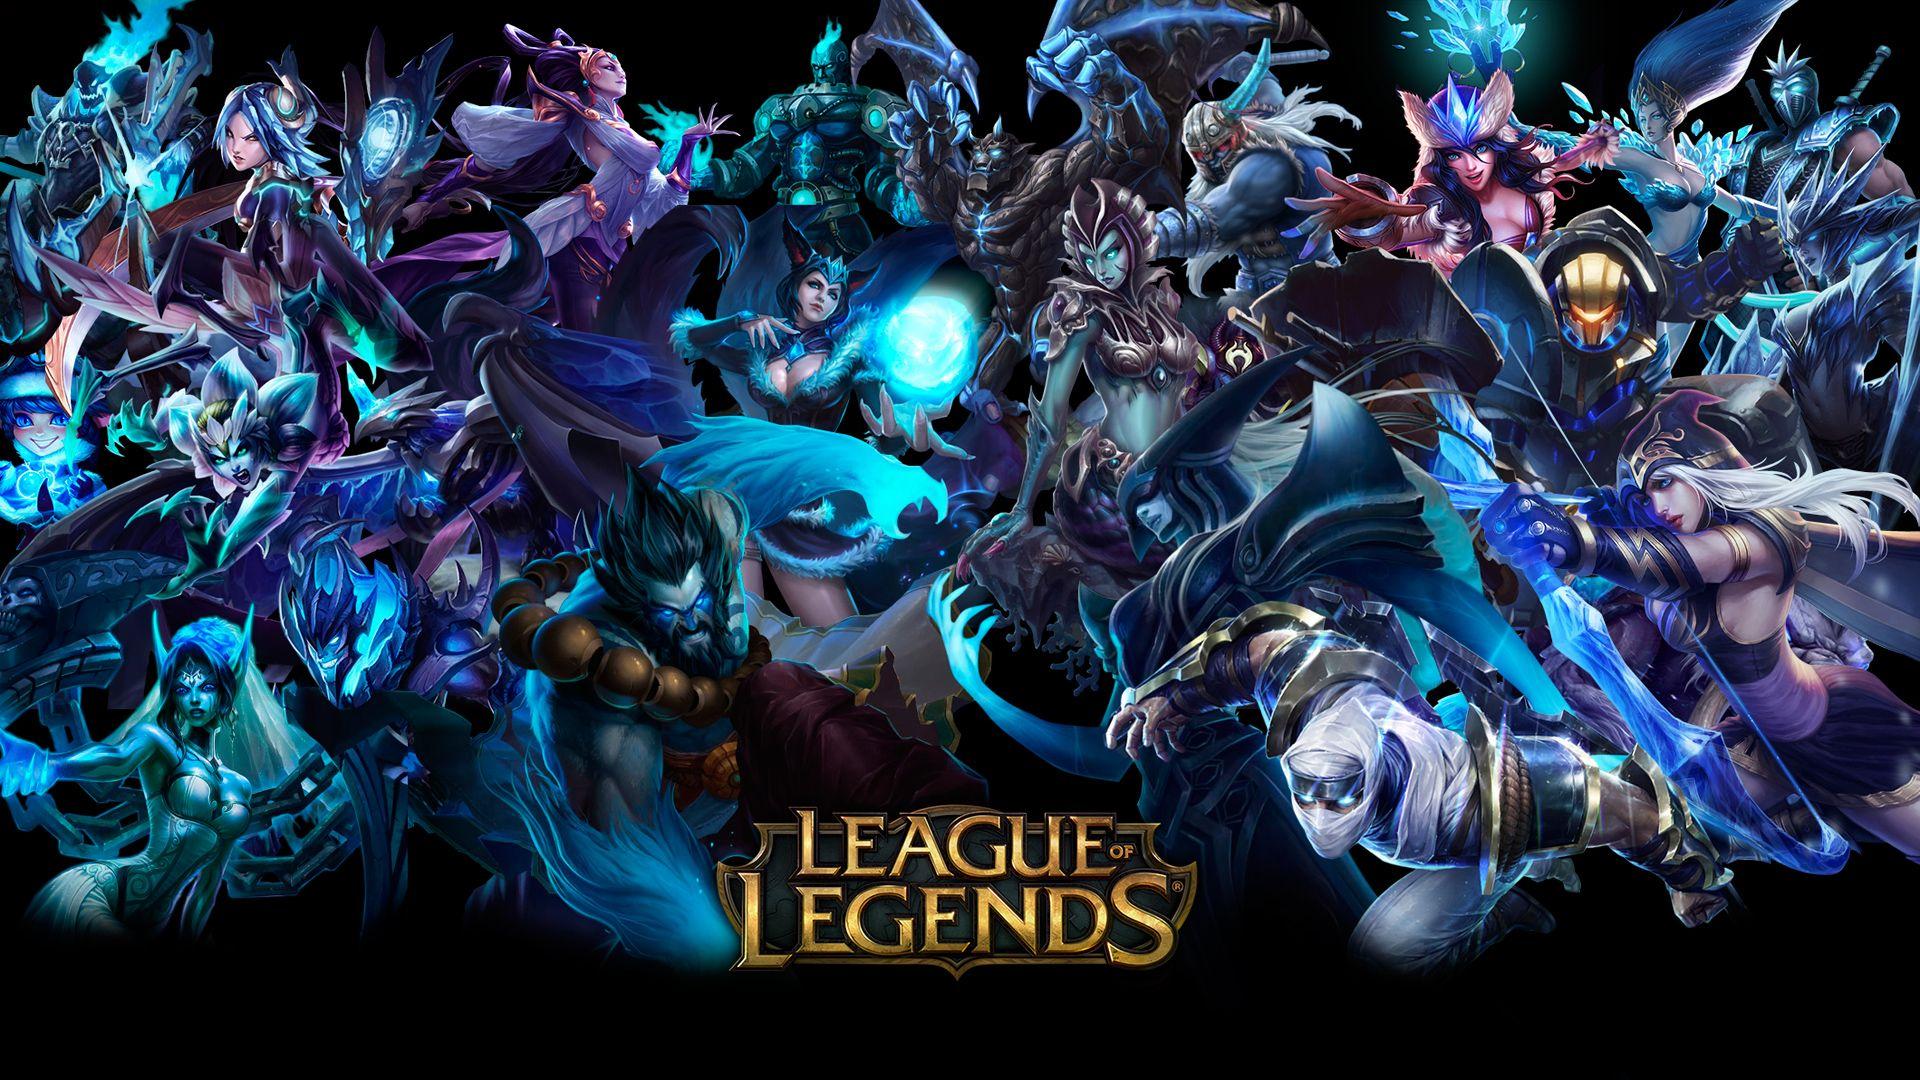 League Of Legends Wallpaper 1920x1080 Draven Hd Background 9 Hd Wallpapers Play League Of Legends League Of Legends League Of Legends Account